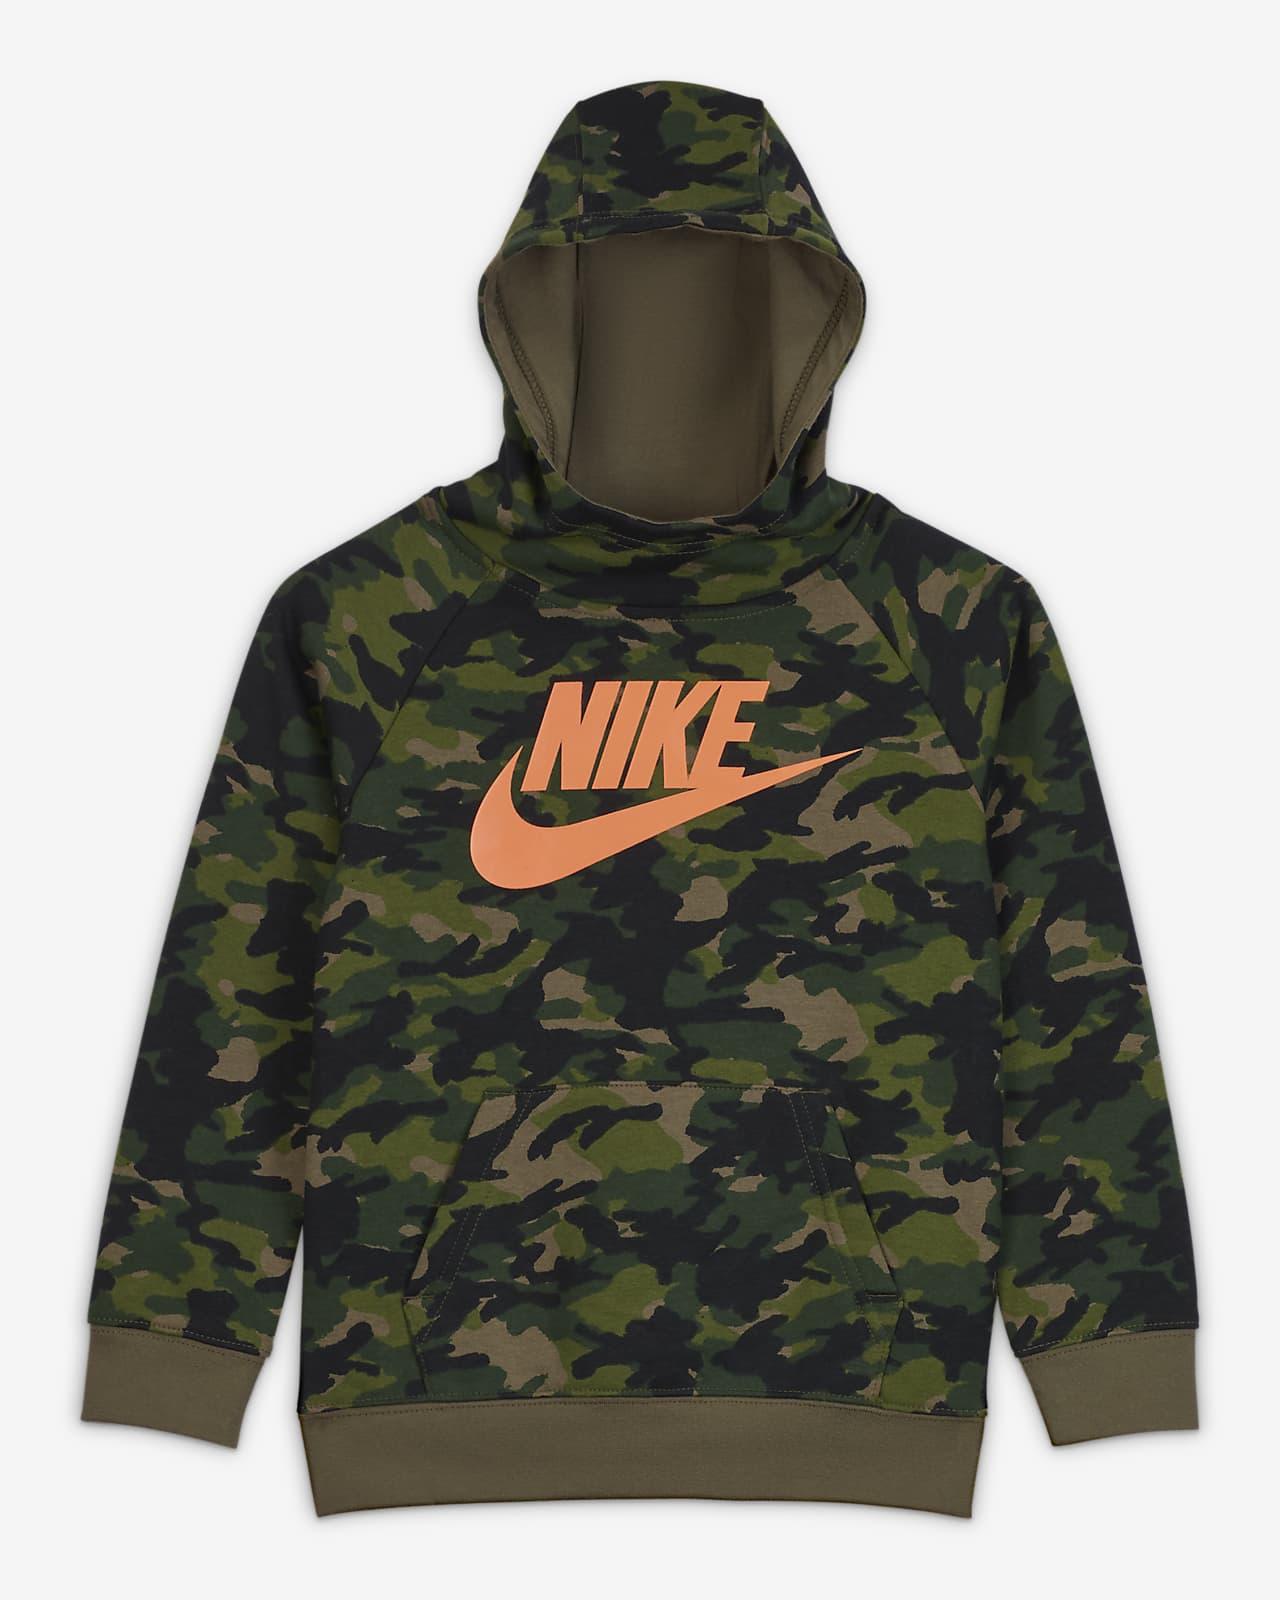 Nike Little Kids' Camo Pullover Hoodie